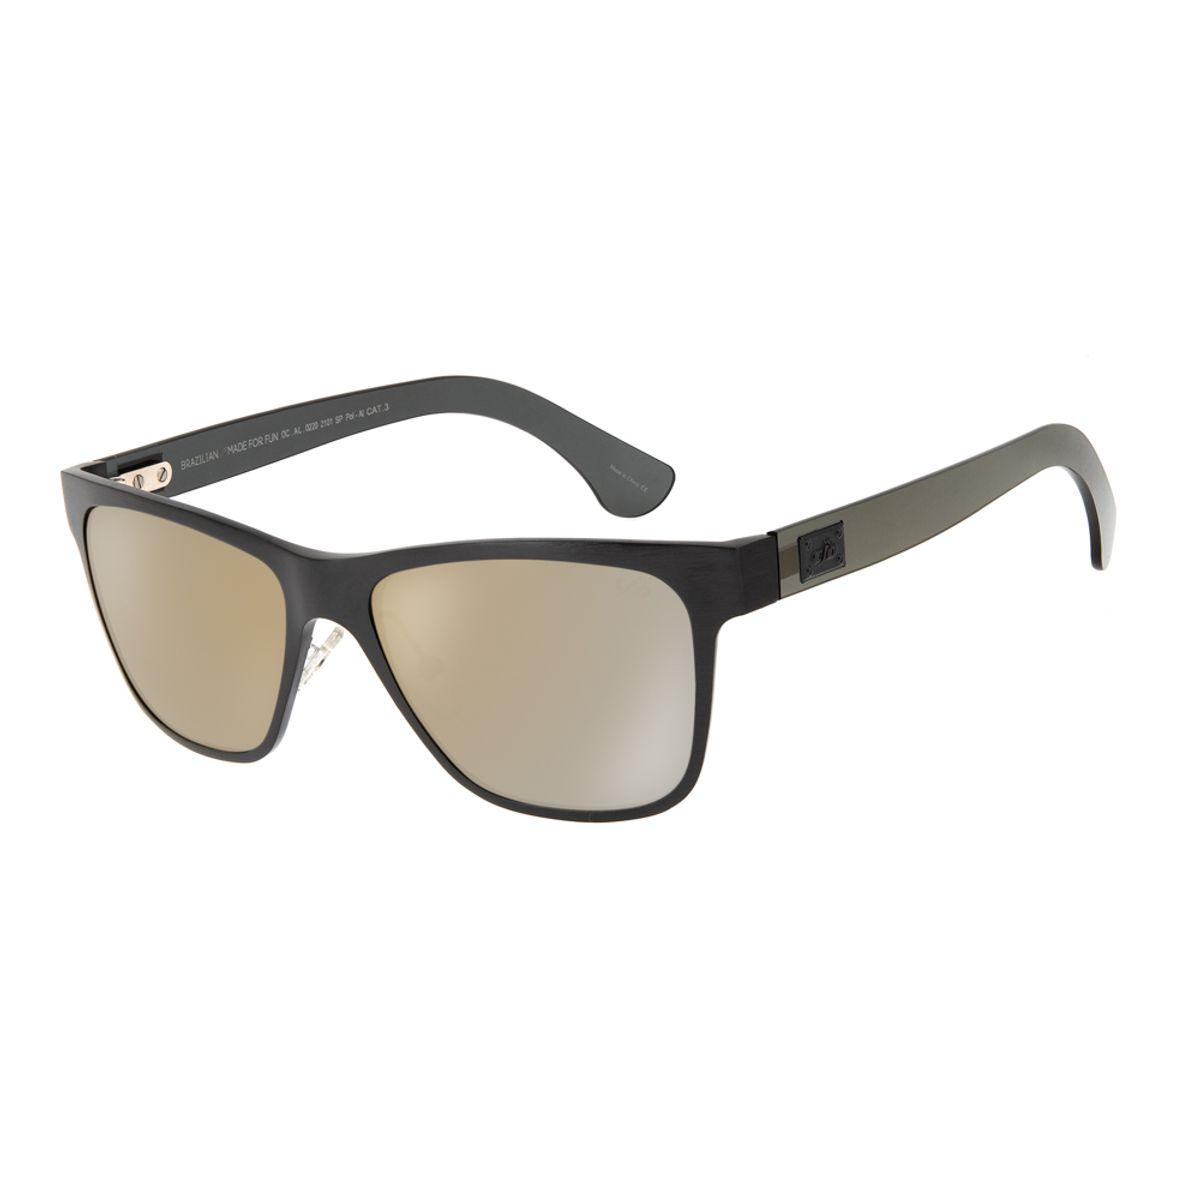 8abcbb571 Óculos de Sol Chilli Beans Masculino Esportivo Polarizado Preto 0220 ...